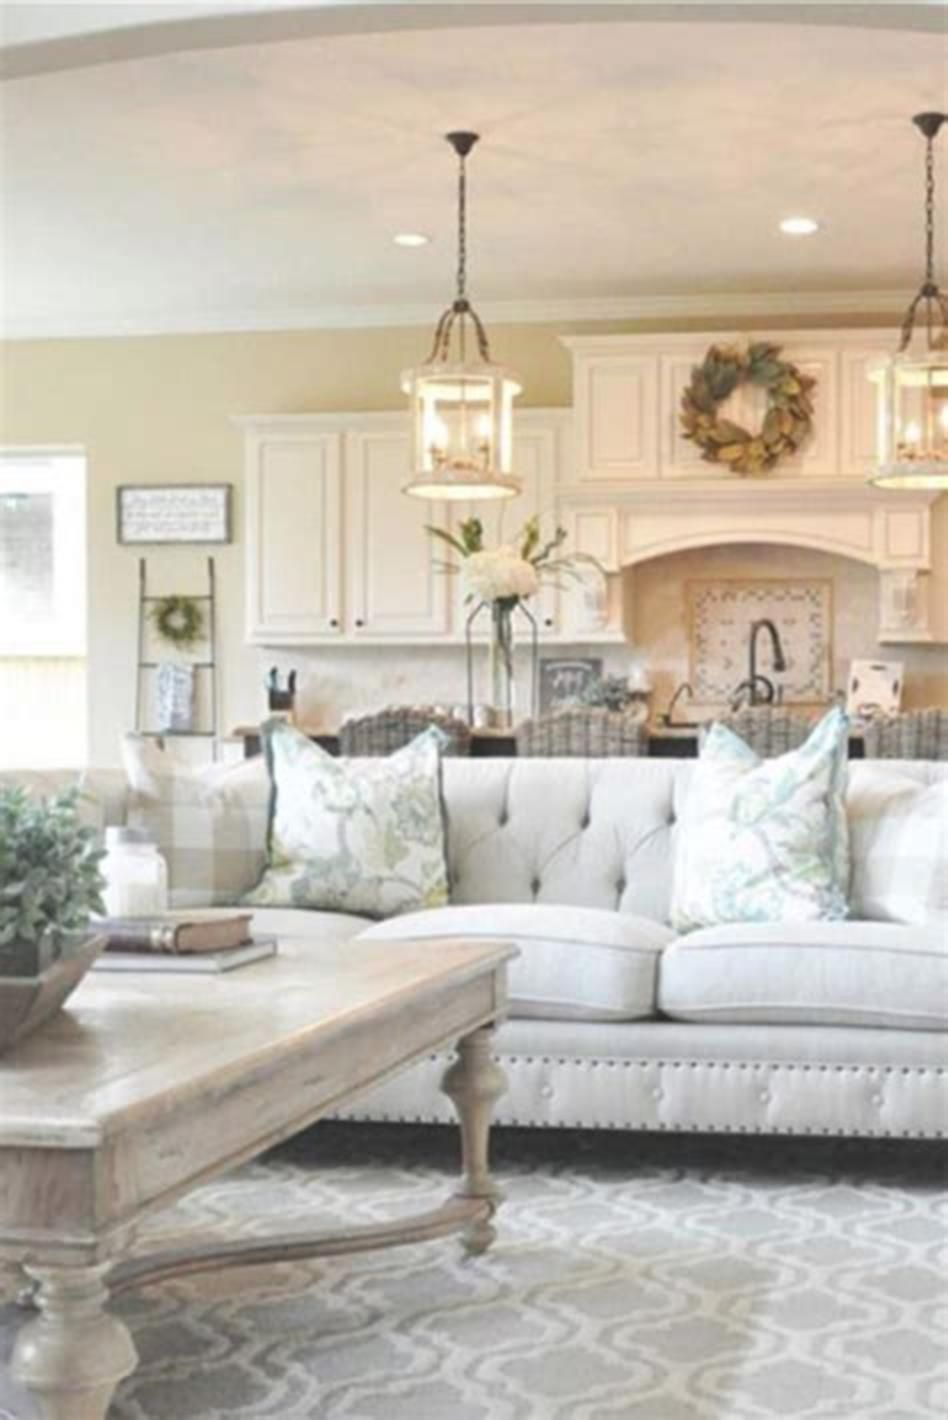 30 Best Shabby Chic Farmhouse Living Room Decor Ideas 2019 Craft Home Ideas Country Living Room Farm House Living Room French Country Living Room